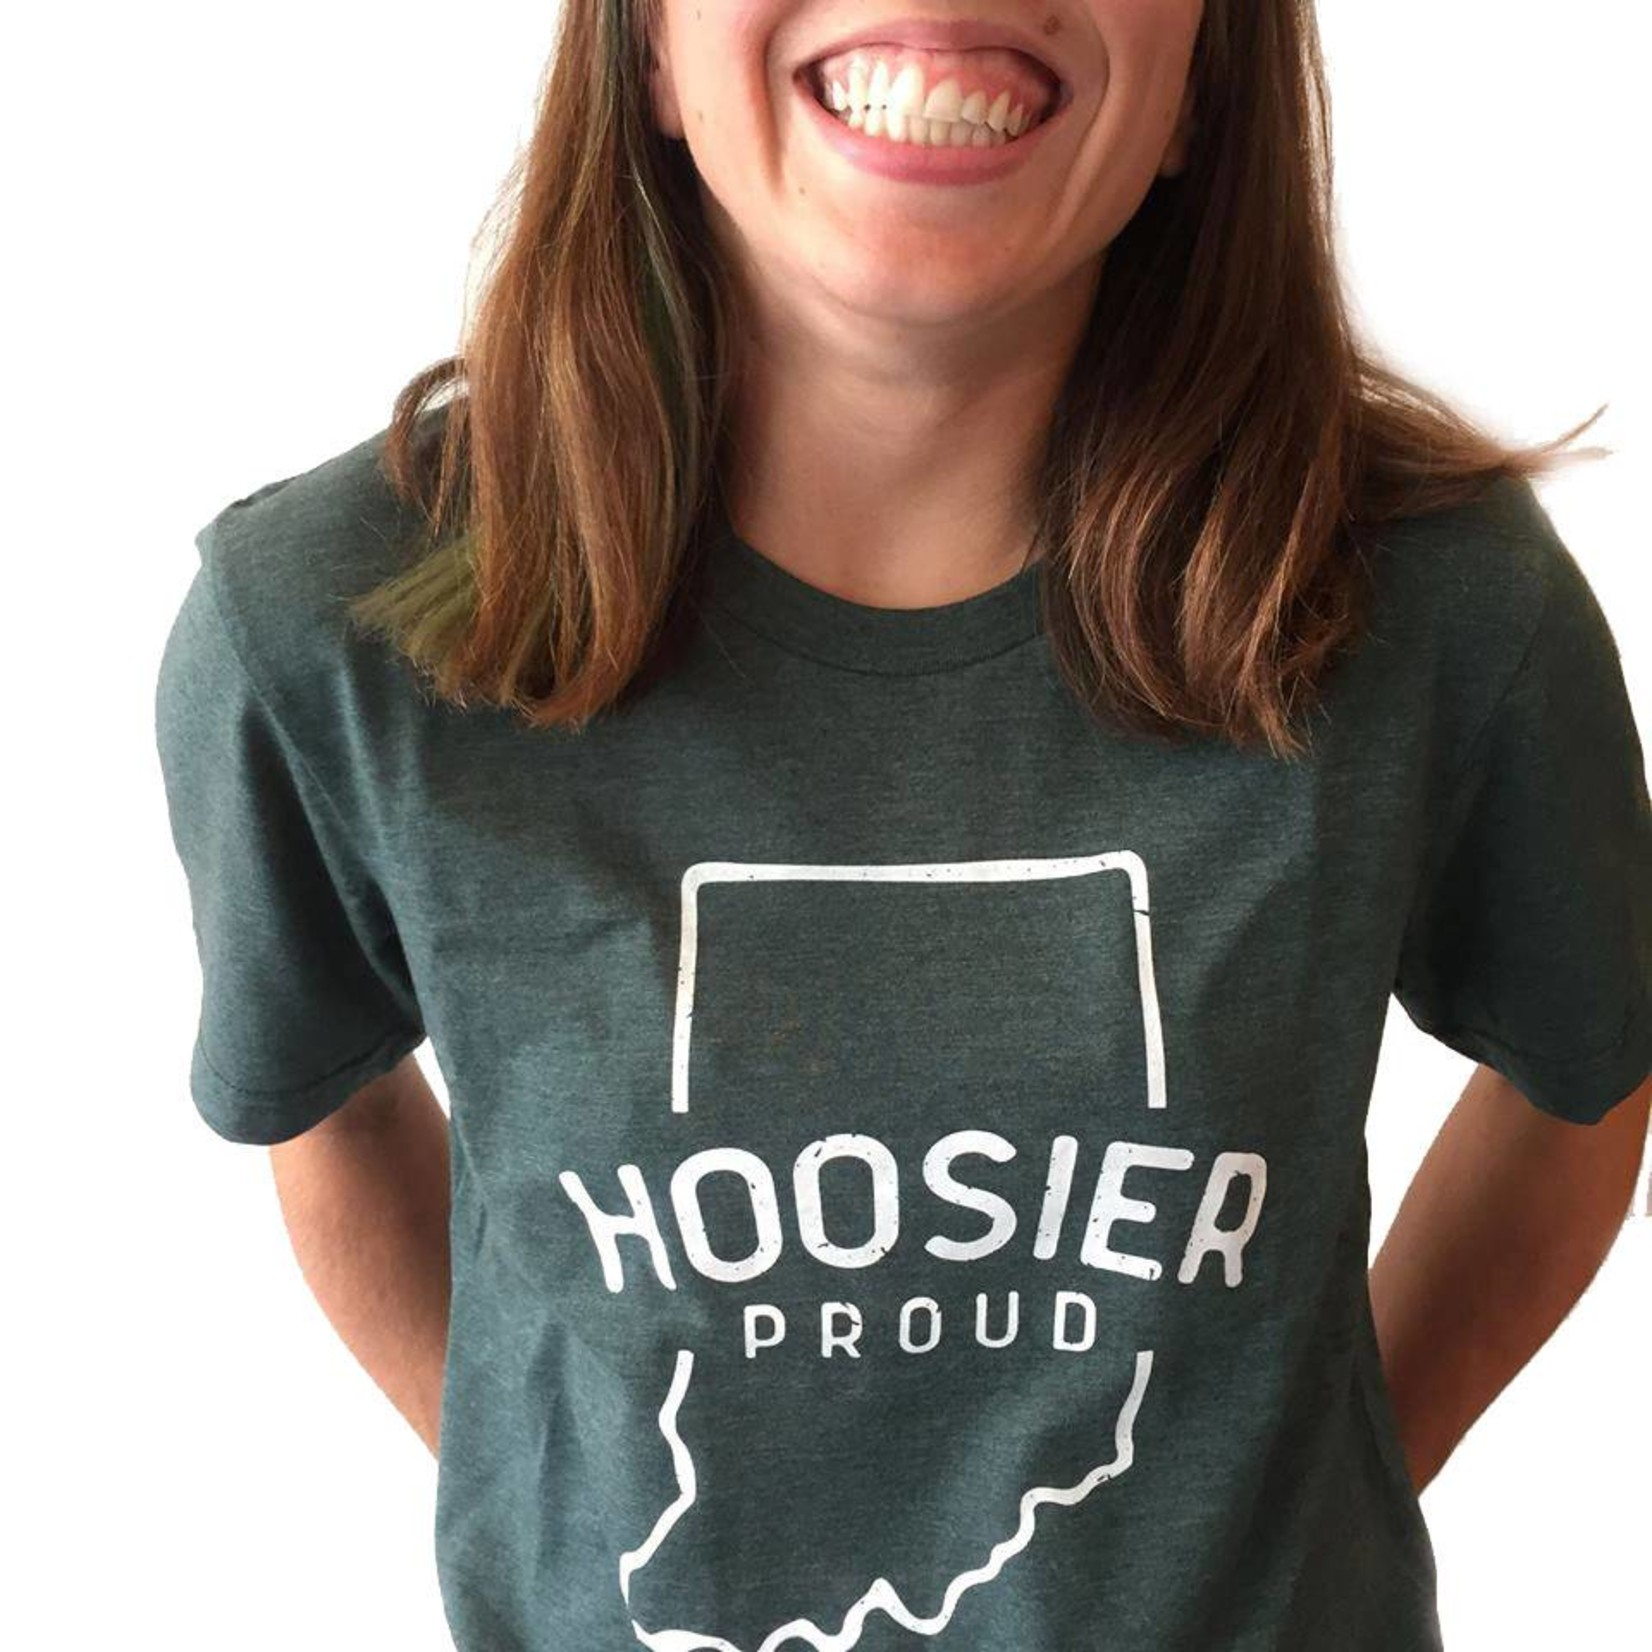 Hoosier Proud Hoosier Proud Logo Tee (unisex fit)